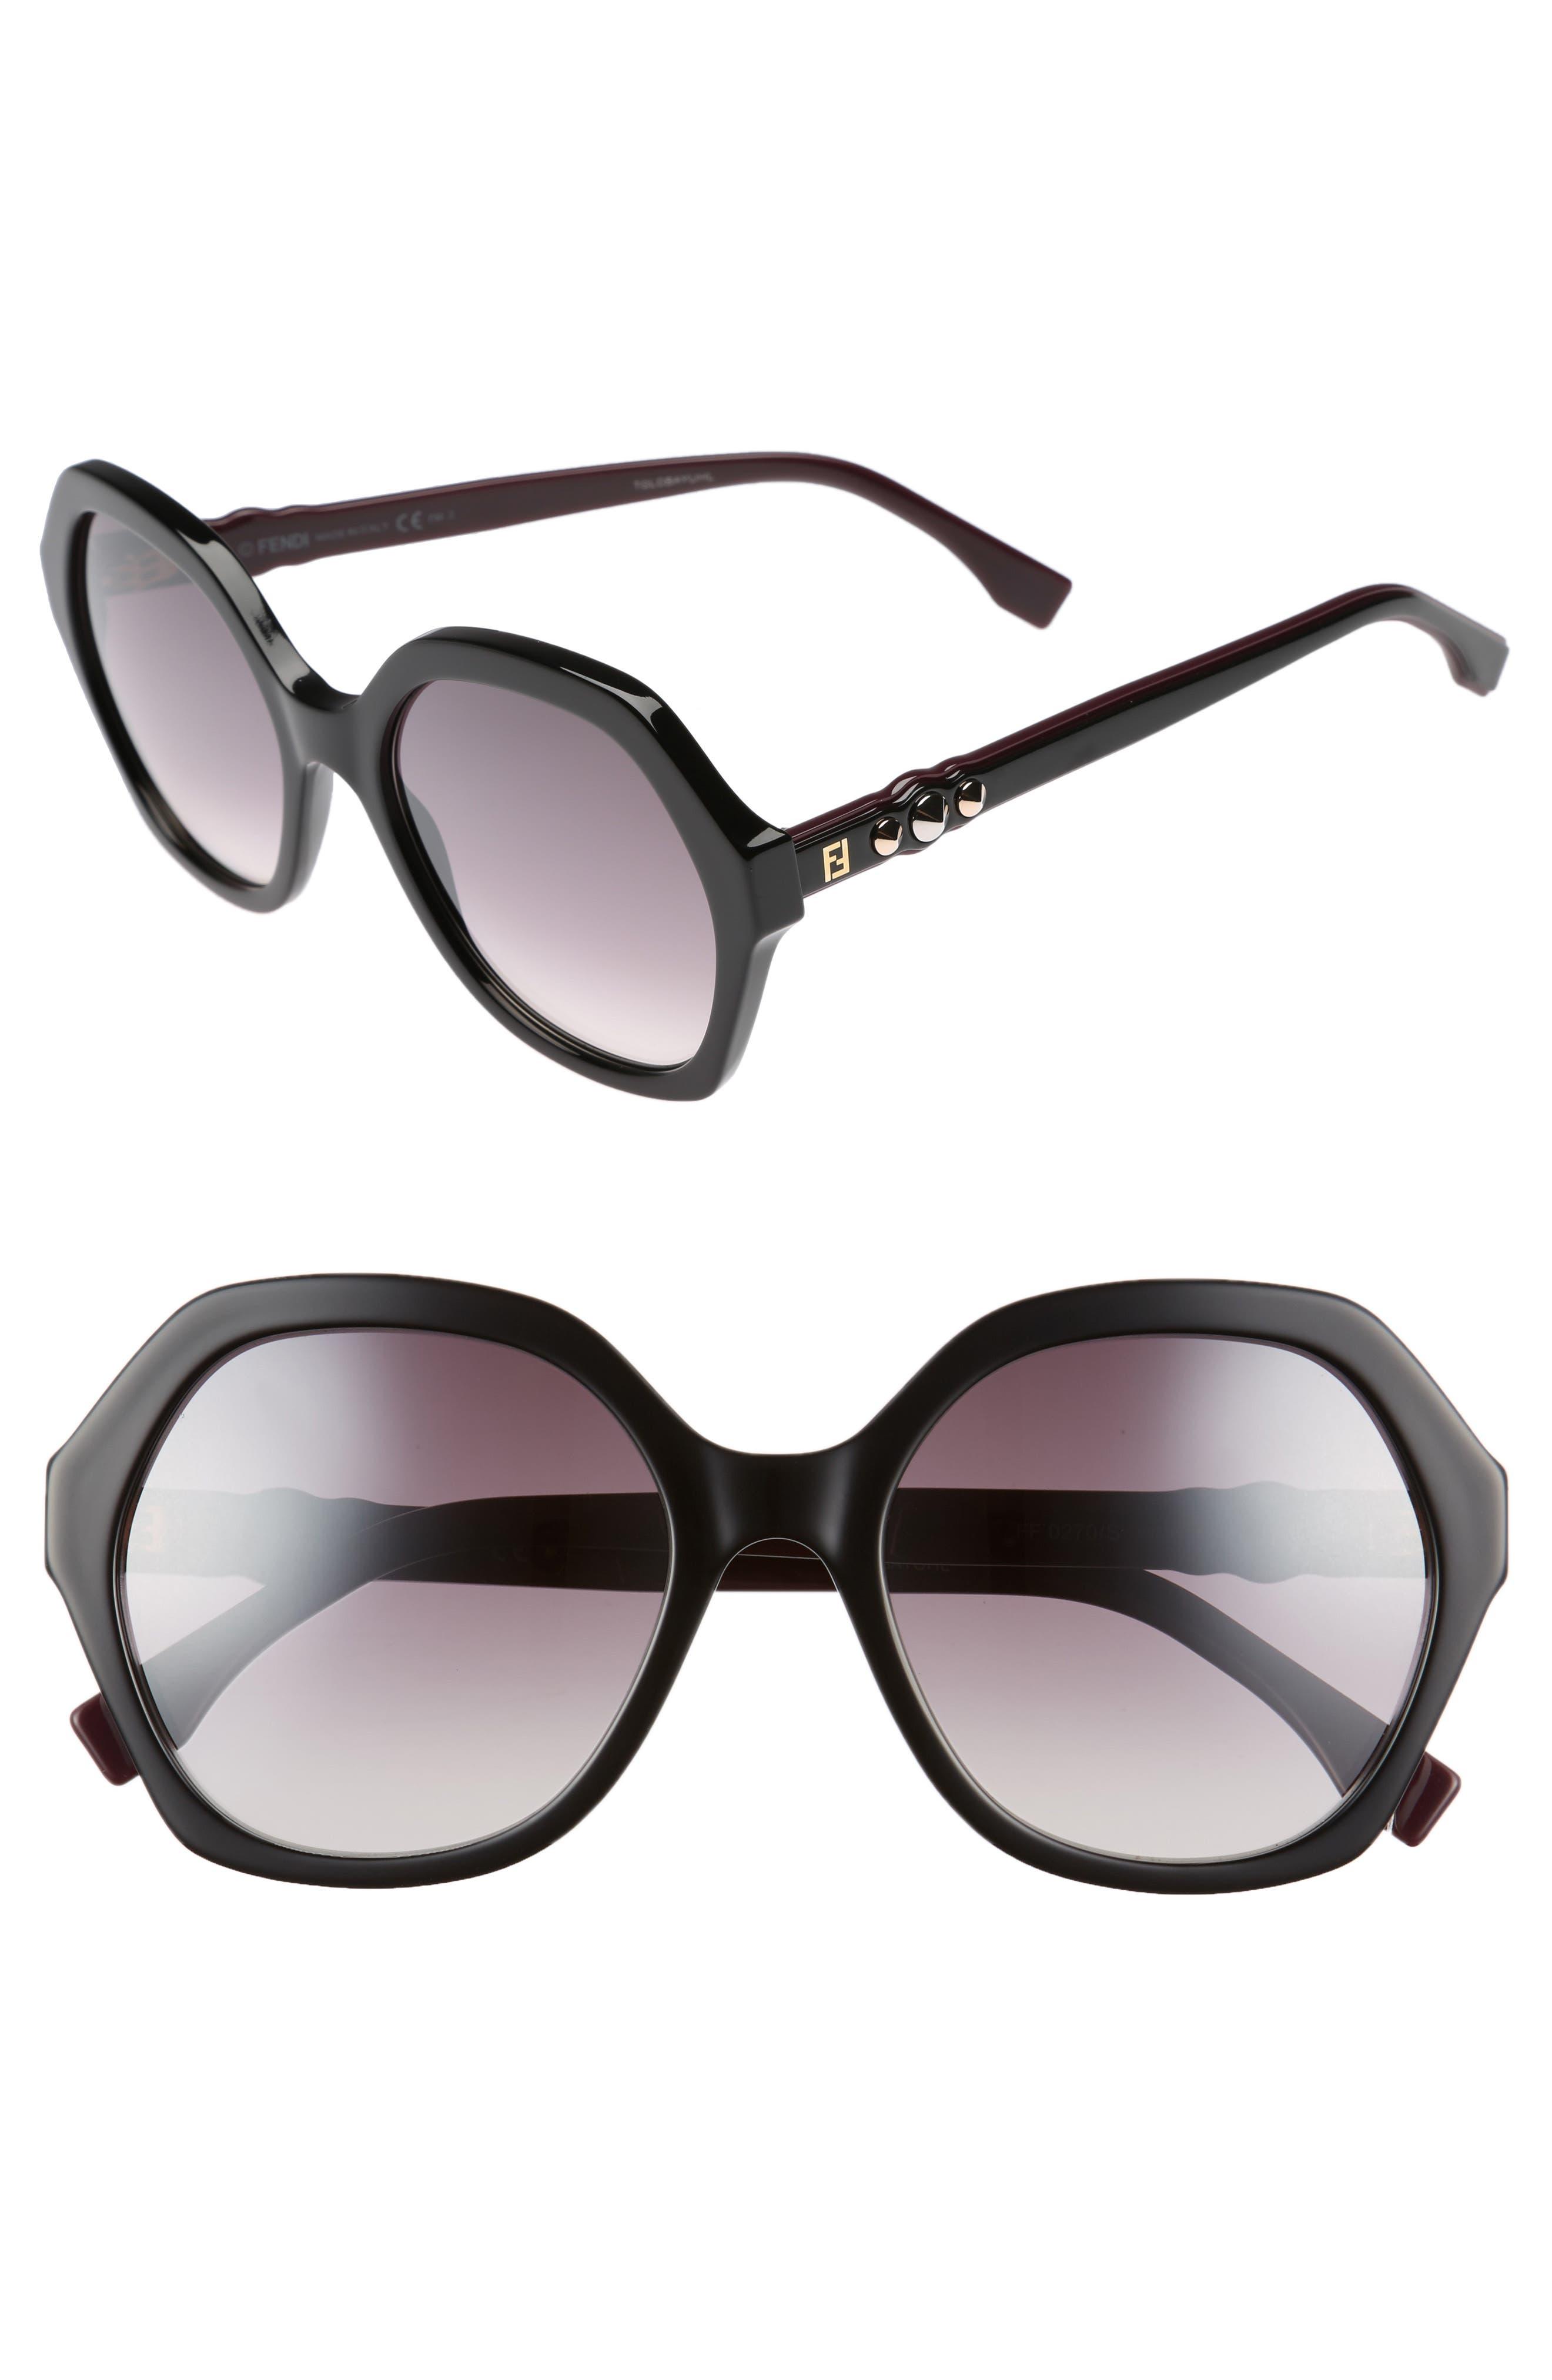 Fendi 56mm Oversize Sunglasses